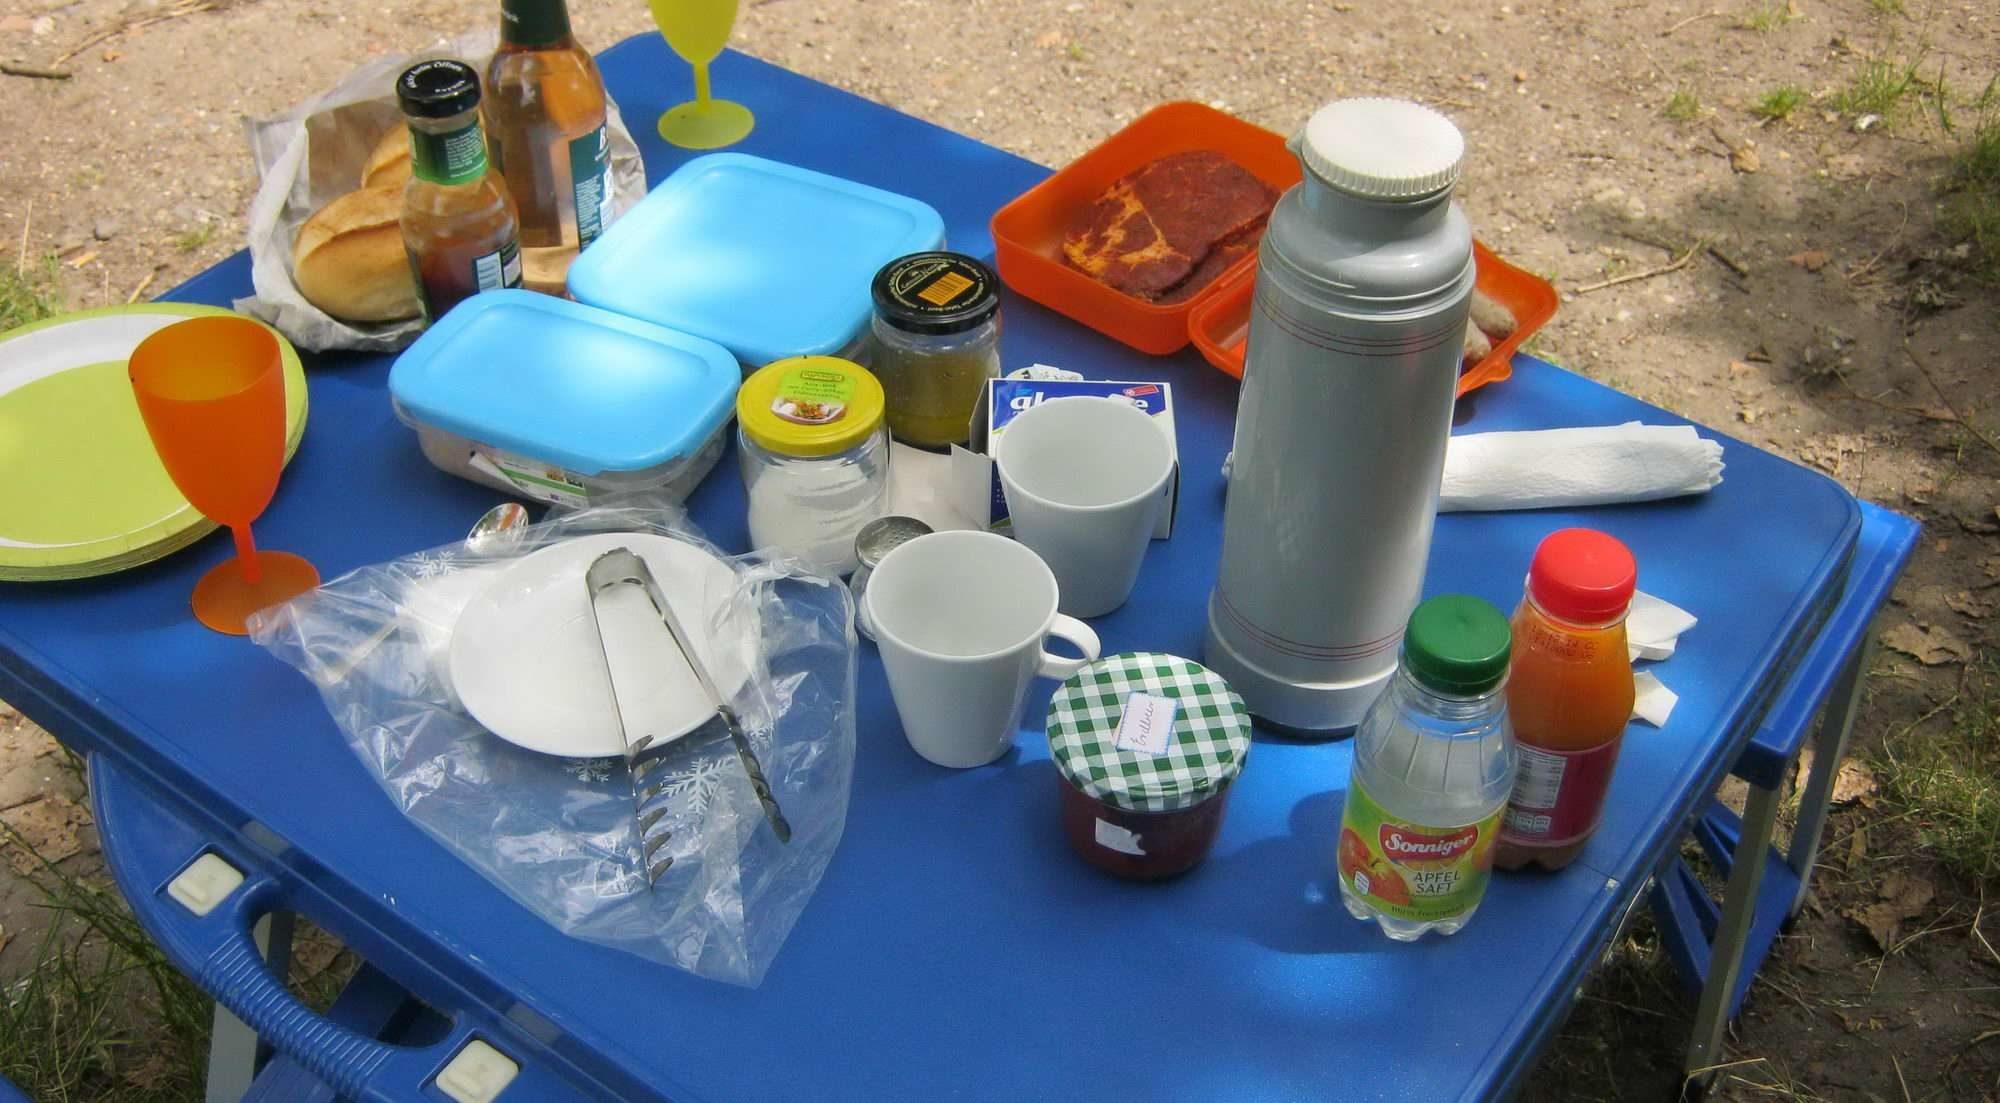 Picknick mit Frau Bode